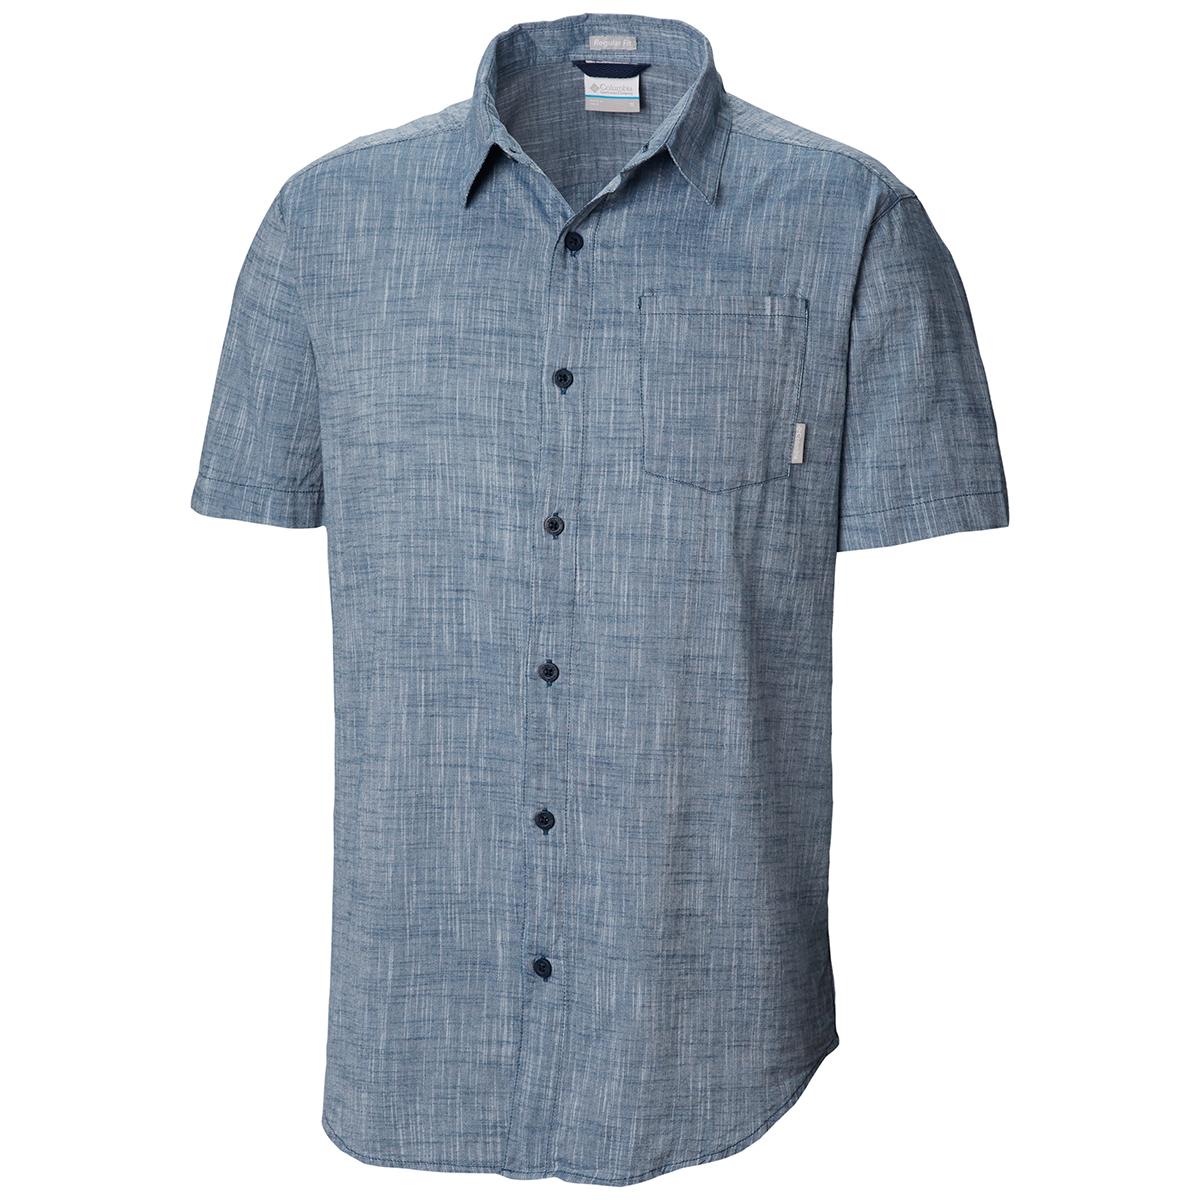 Columbia Men's Under Exposure Yarn-Dye Short Sleeve Shirt - Blue, XL